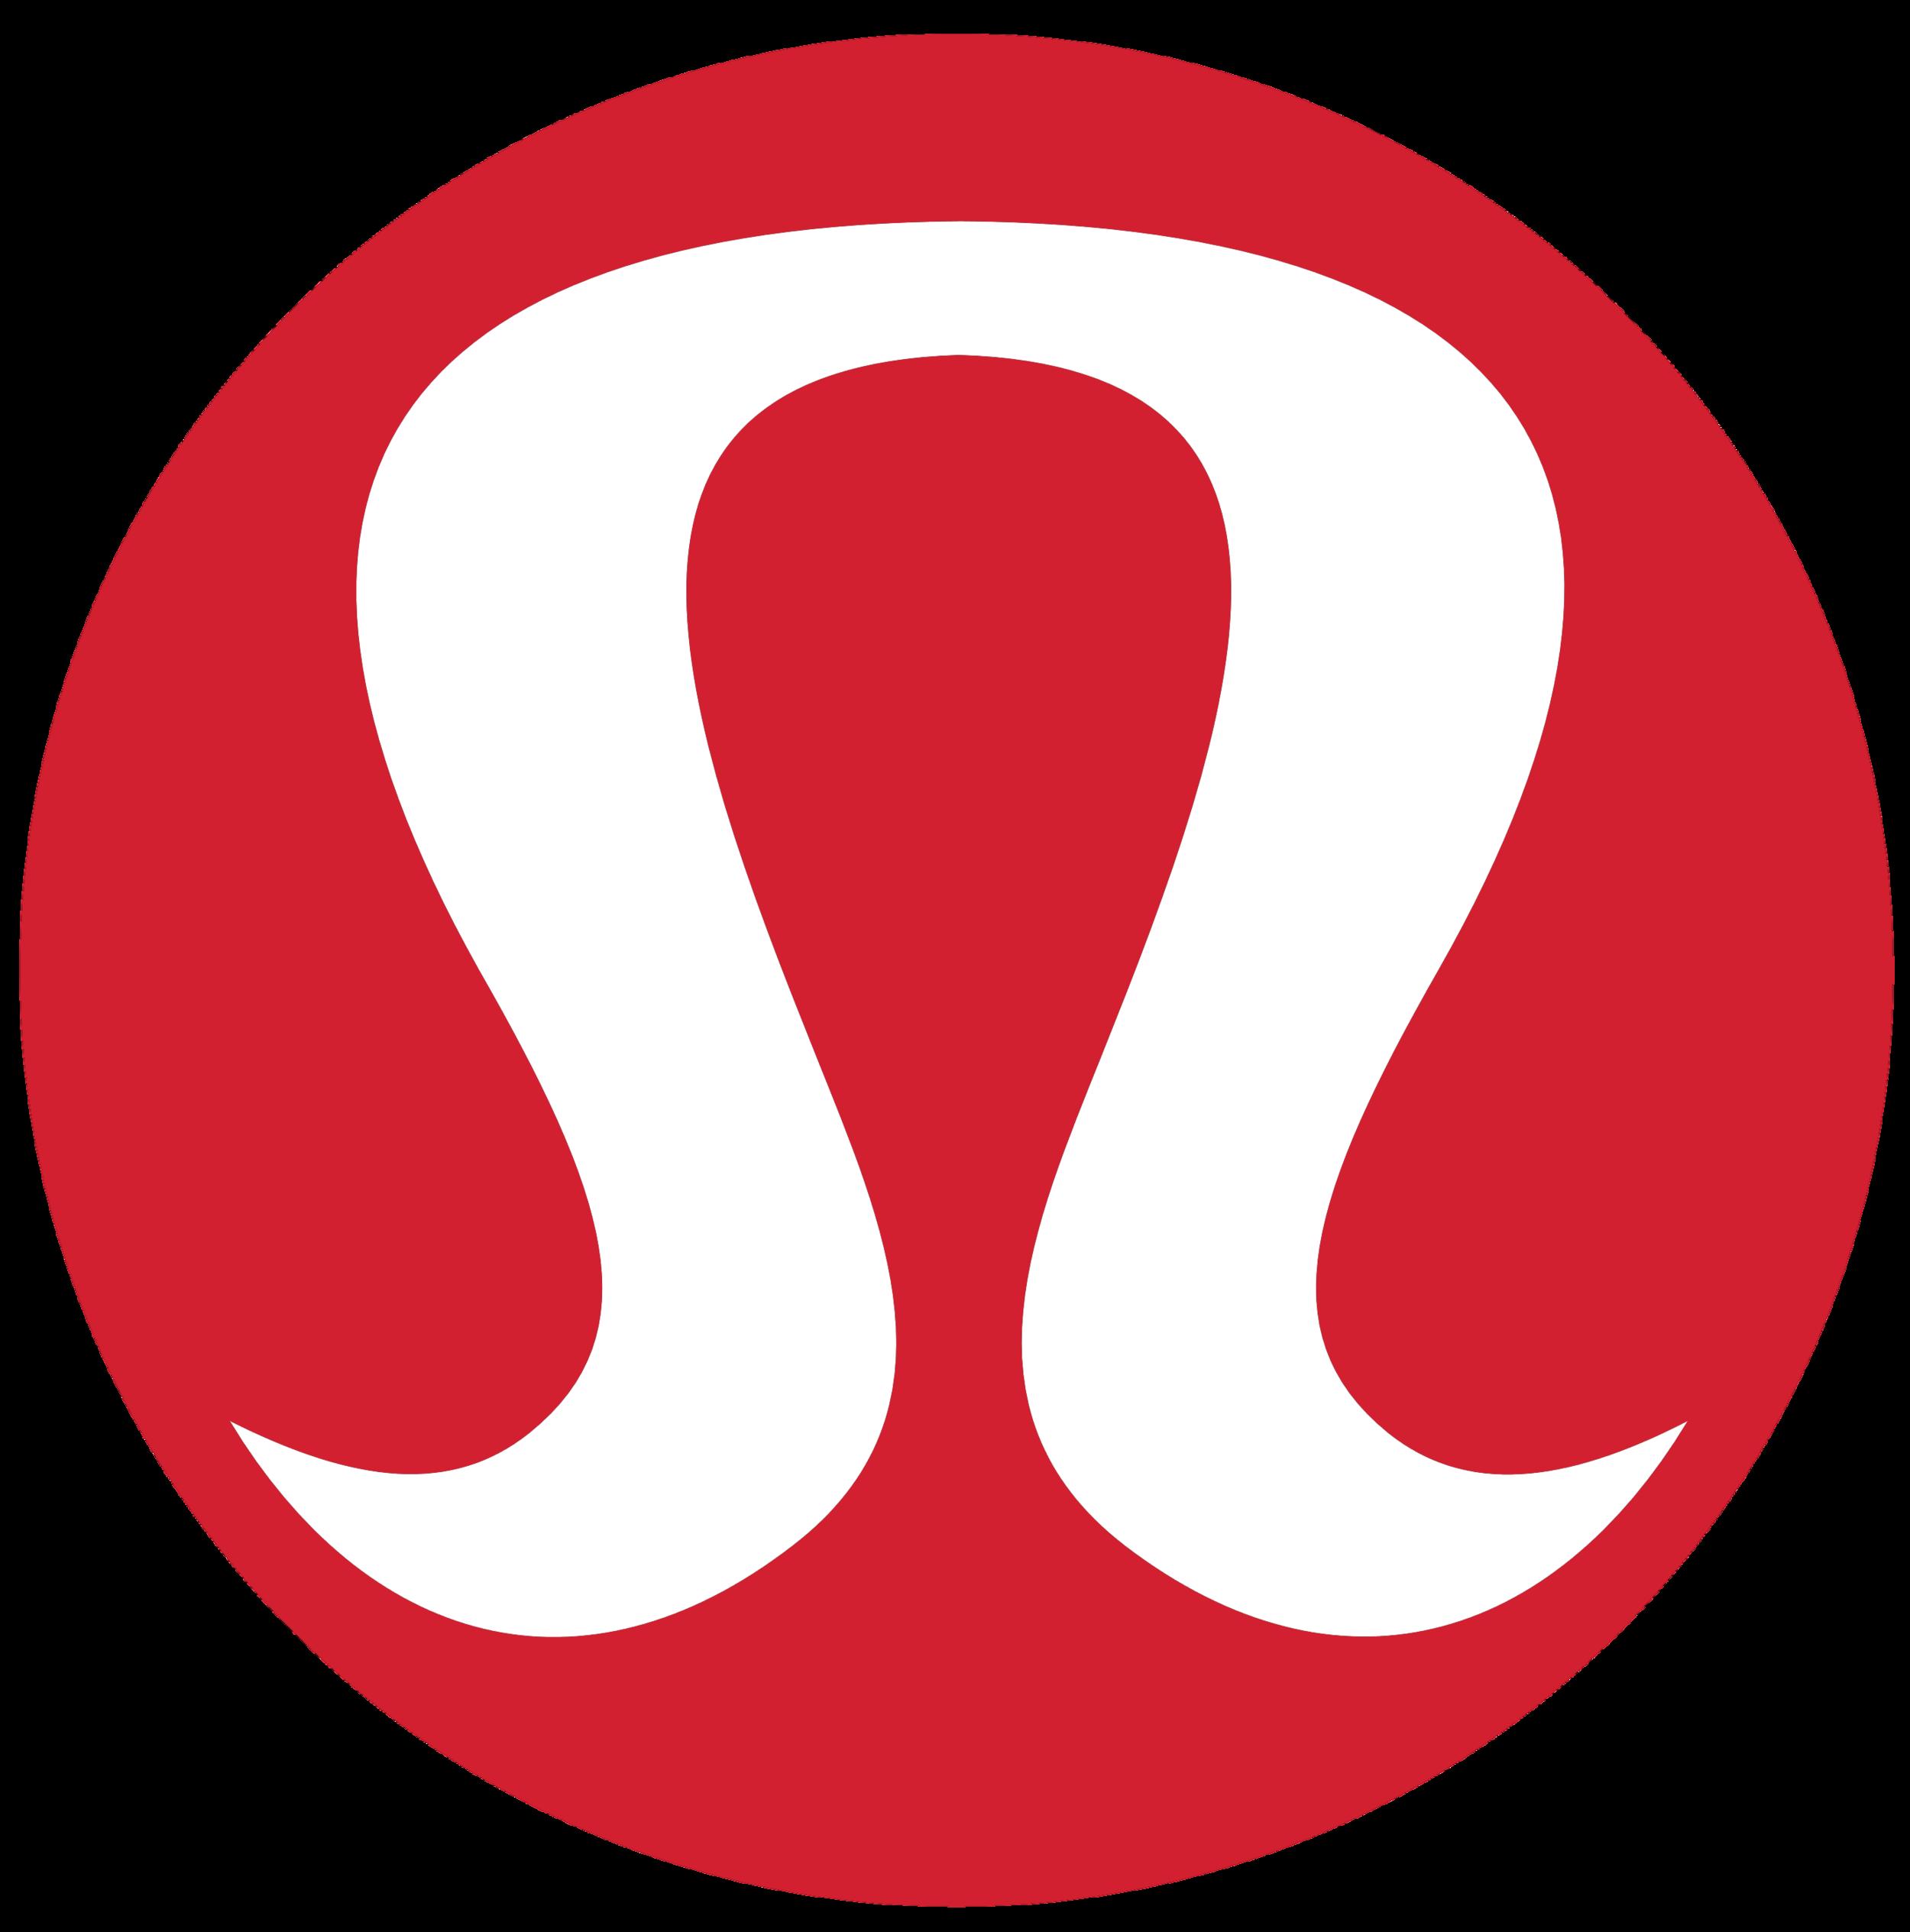 kisspng-lululemon-athletica-logo-brand-yoga-chicago-bears-5acbbbad8fba01.2264438515233012935887.png